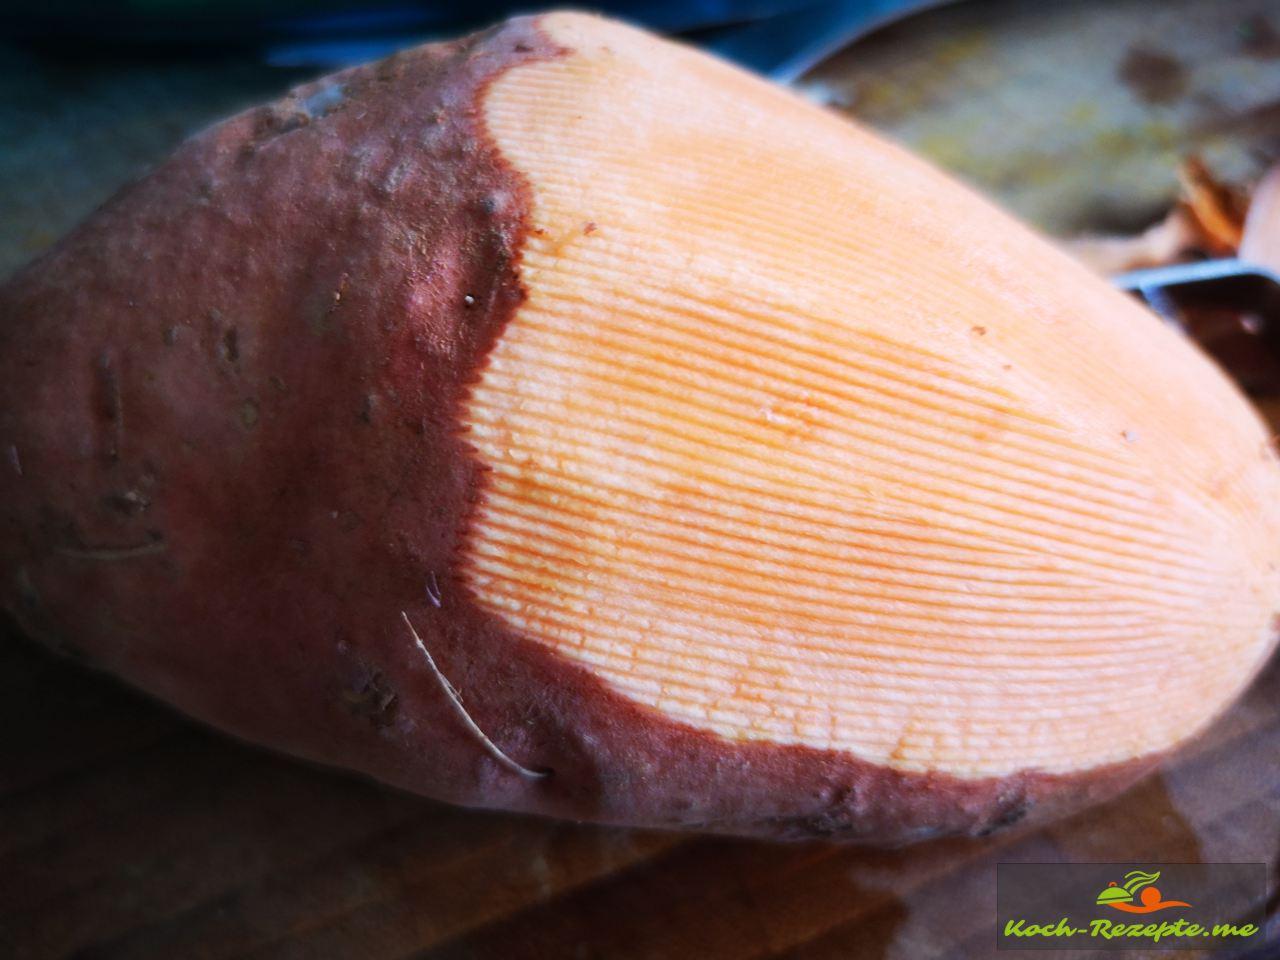 Rotschalige Sorte Süßkartoffel Zubereitung